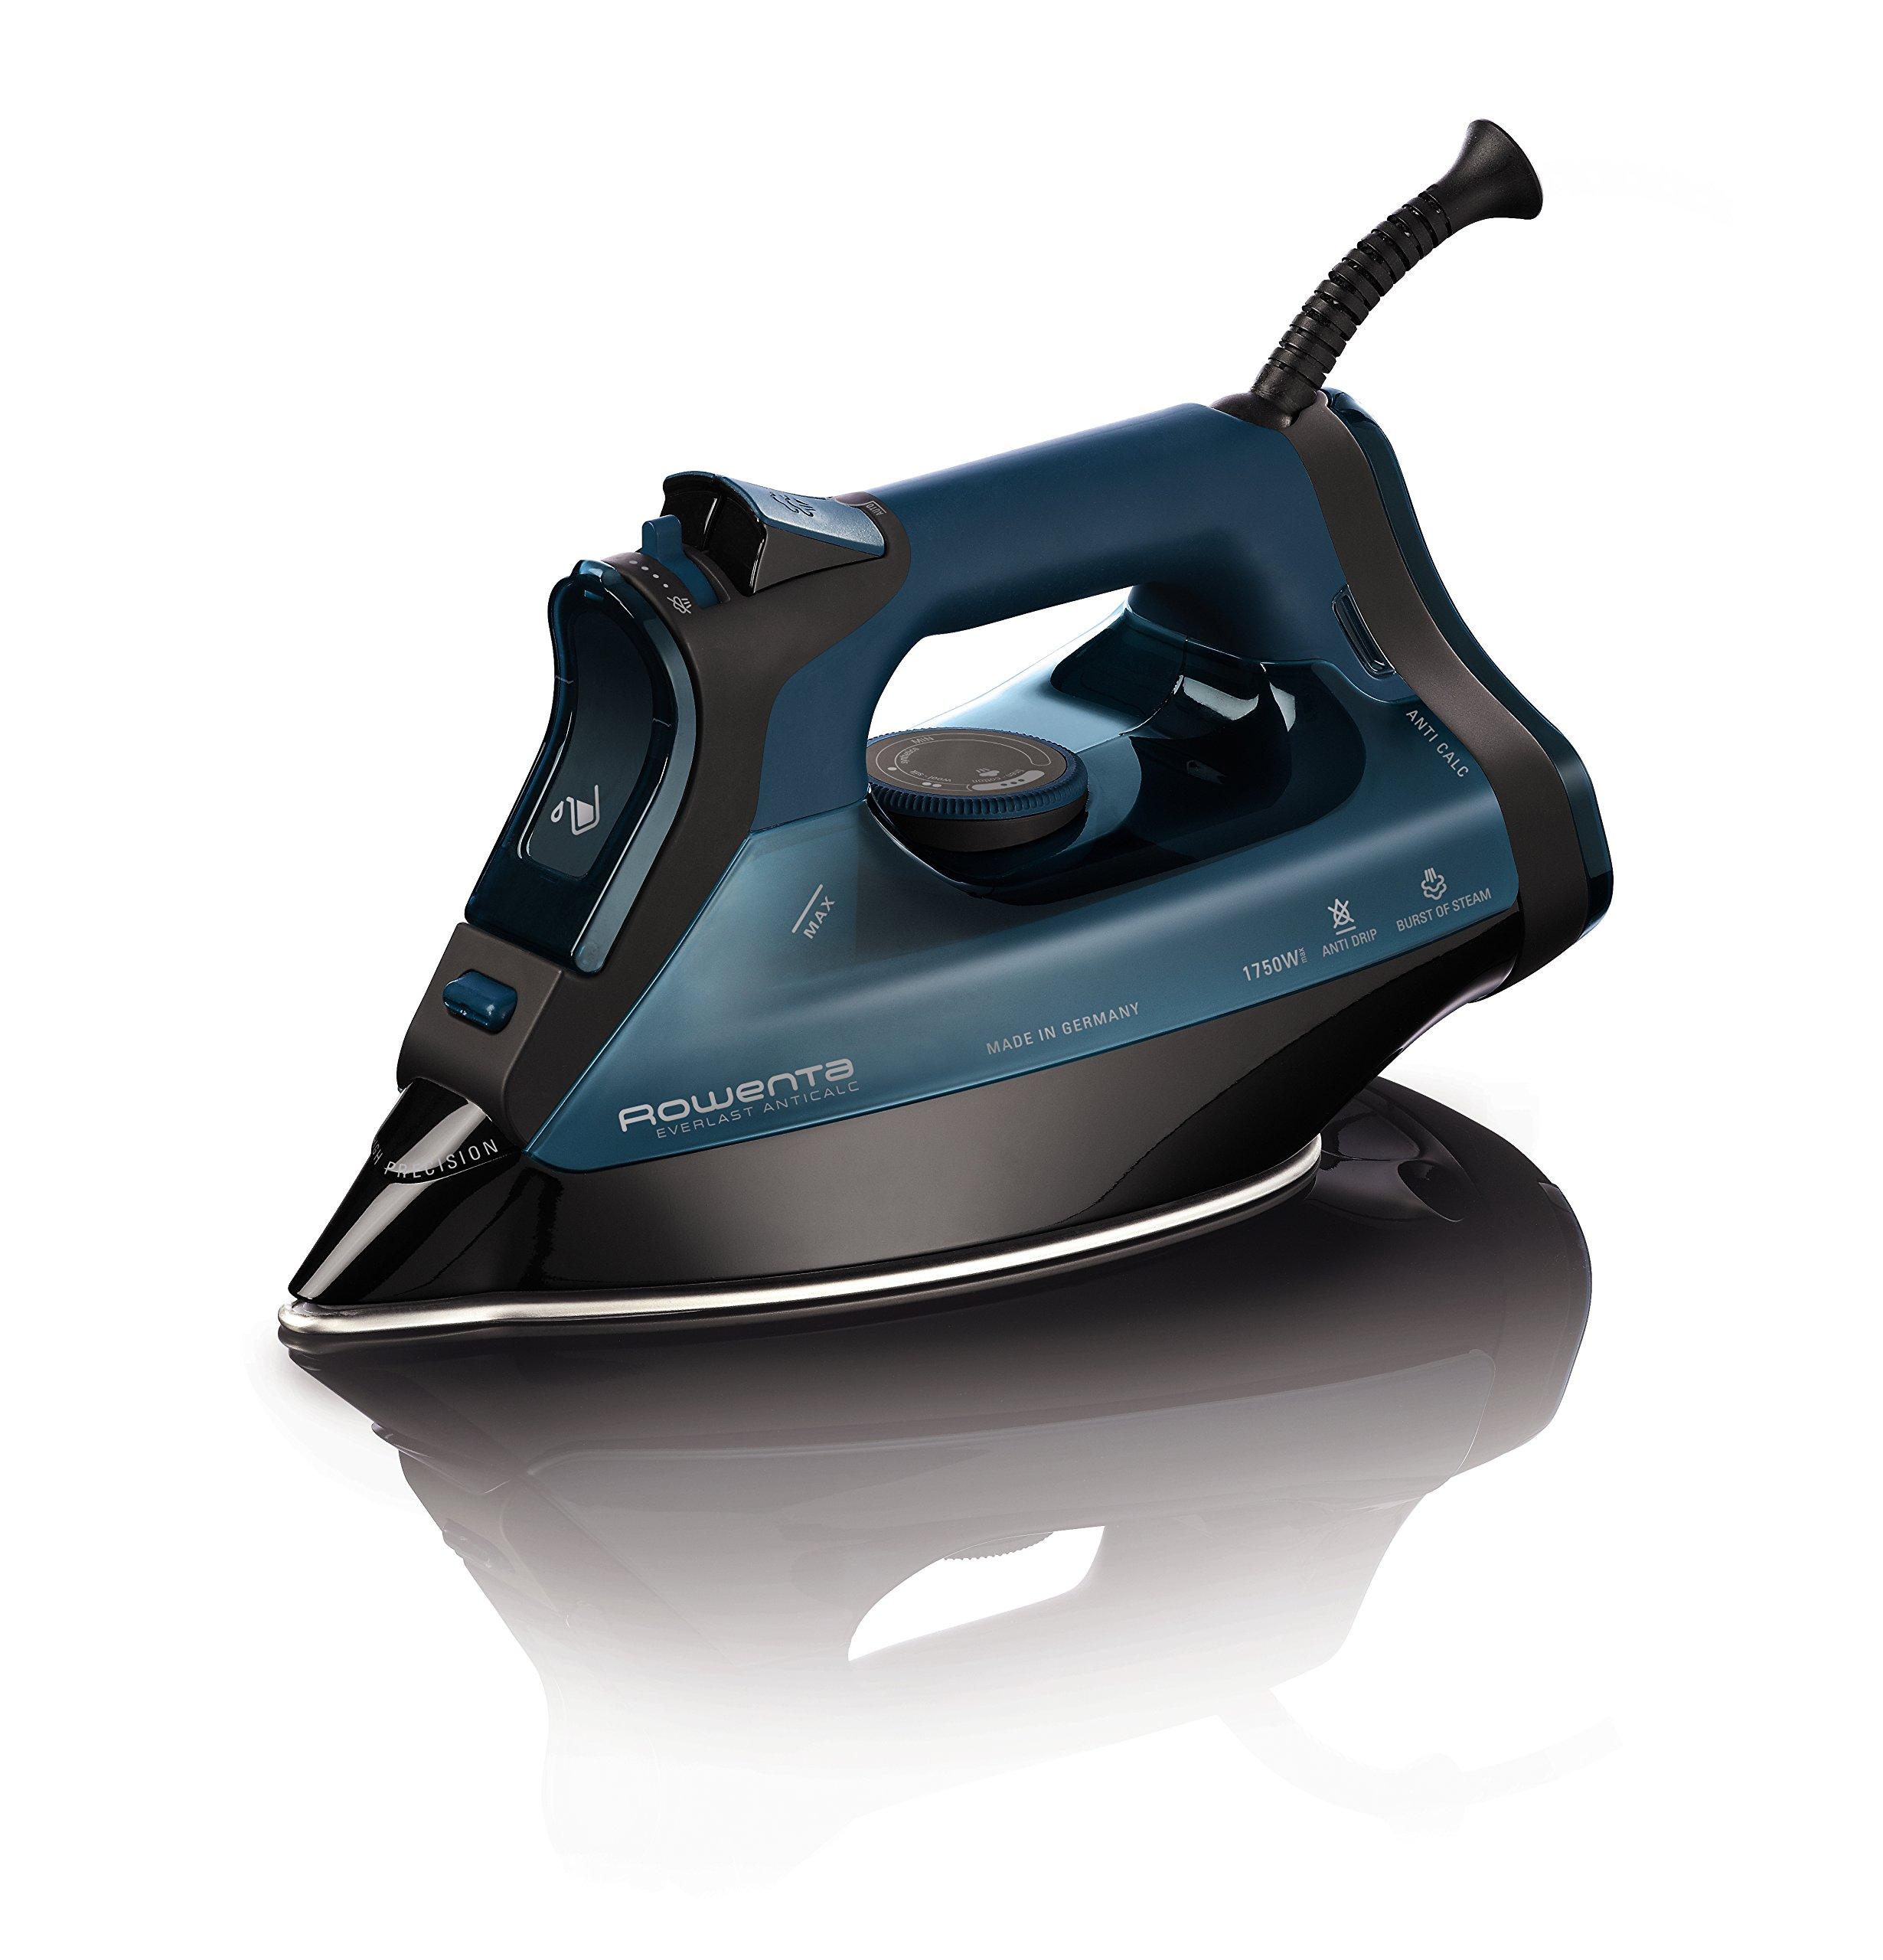 Rowenta DW7180 Everlast 1750-Watt Anti-Calc Steam Iron Stainless Steel Soleplate with Auto-Off, 400-Hole, Blue